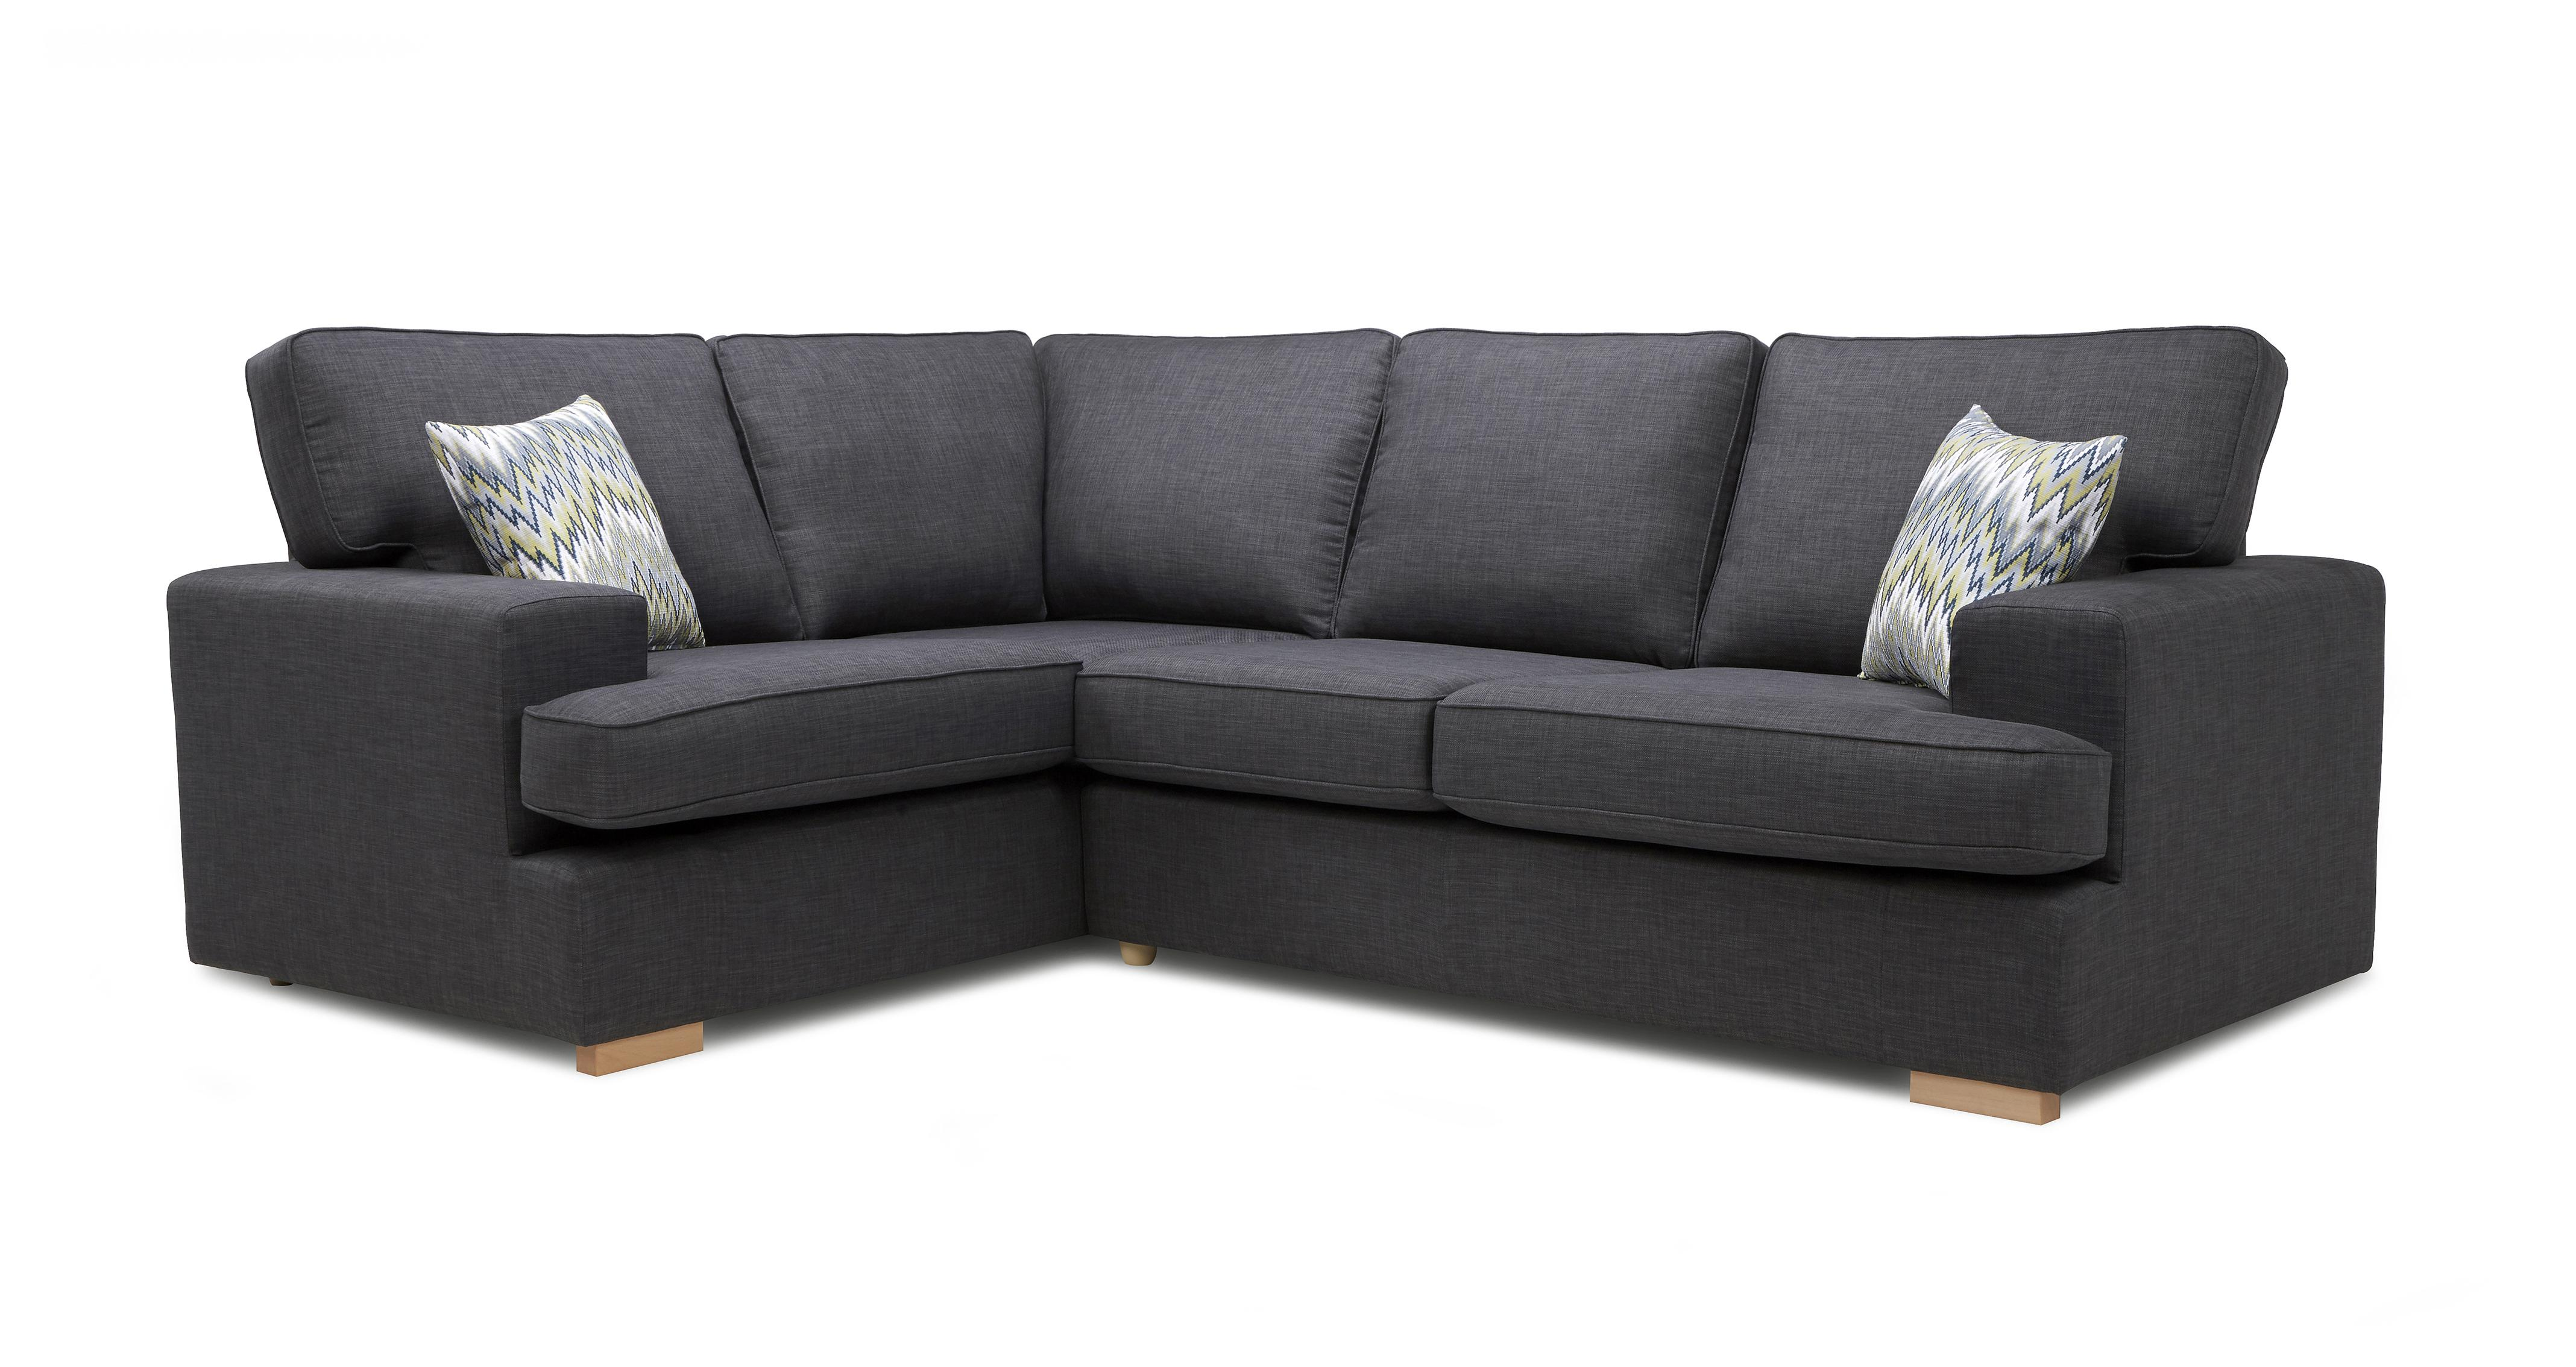 best website e3f2d dbe4d Ludo: Right Hand Facing 2 Seater Corner Sofa